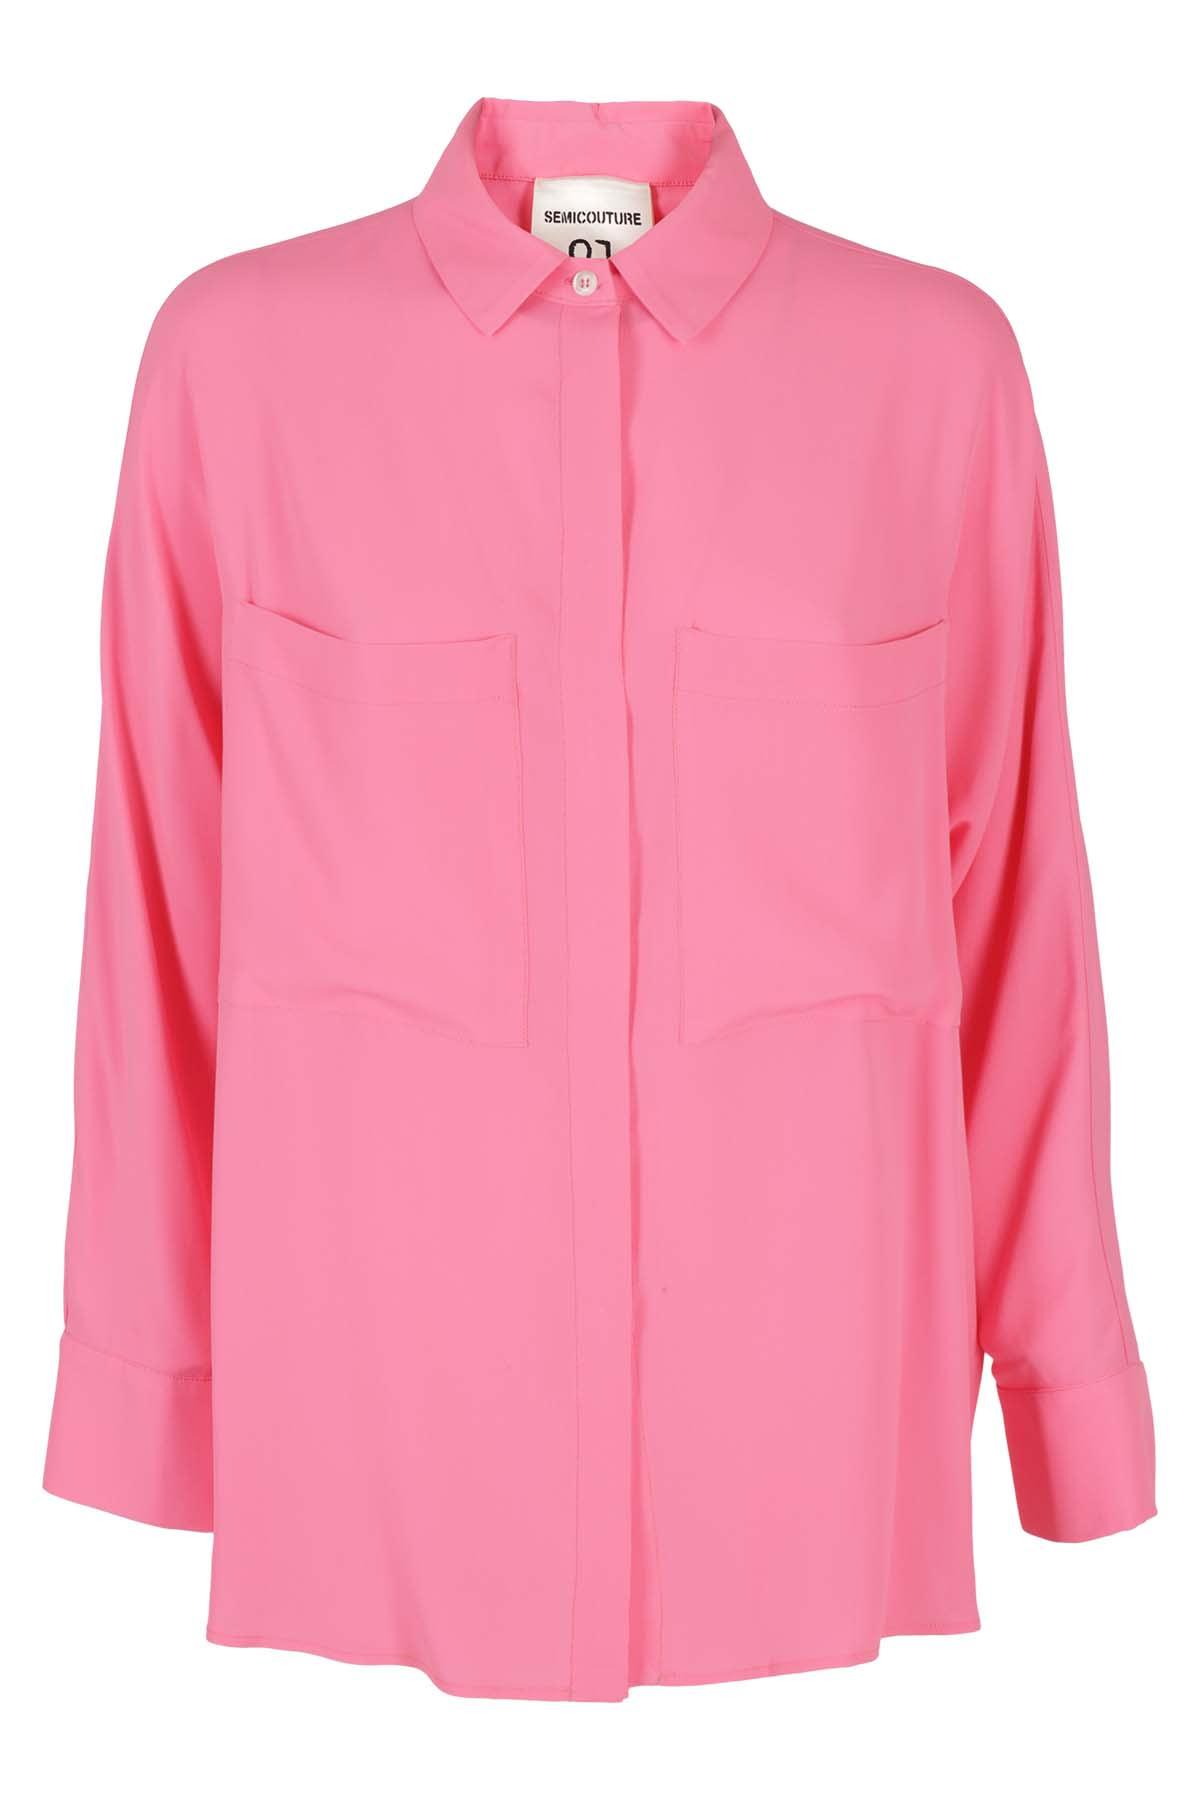 Semicouture Shirts SHIRT